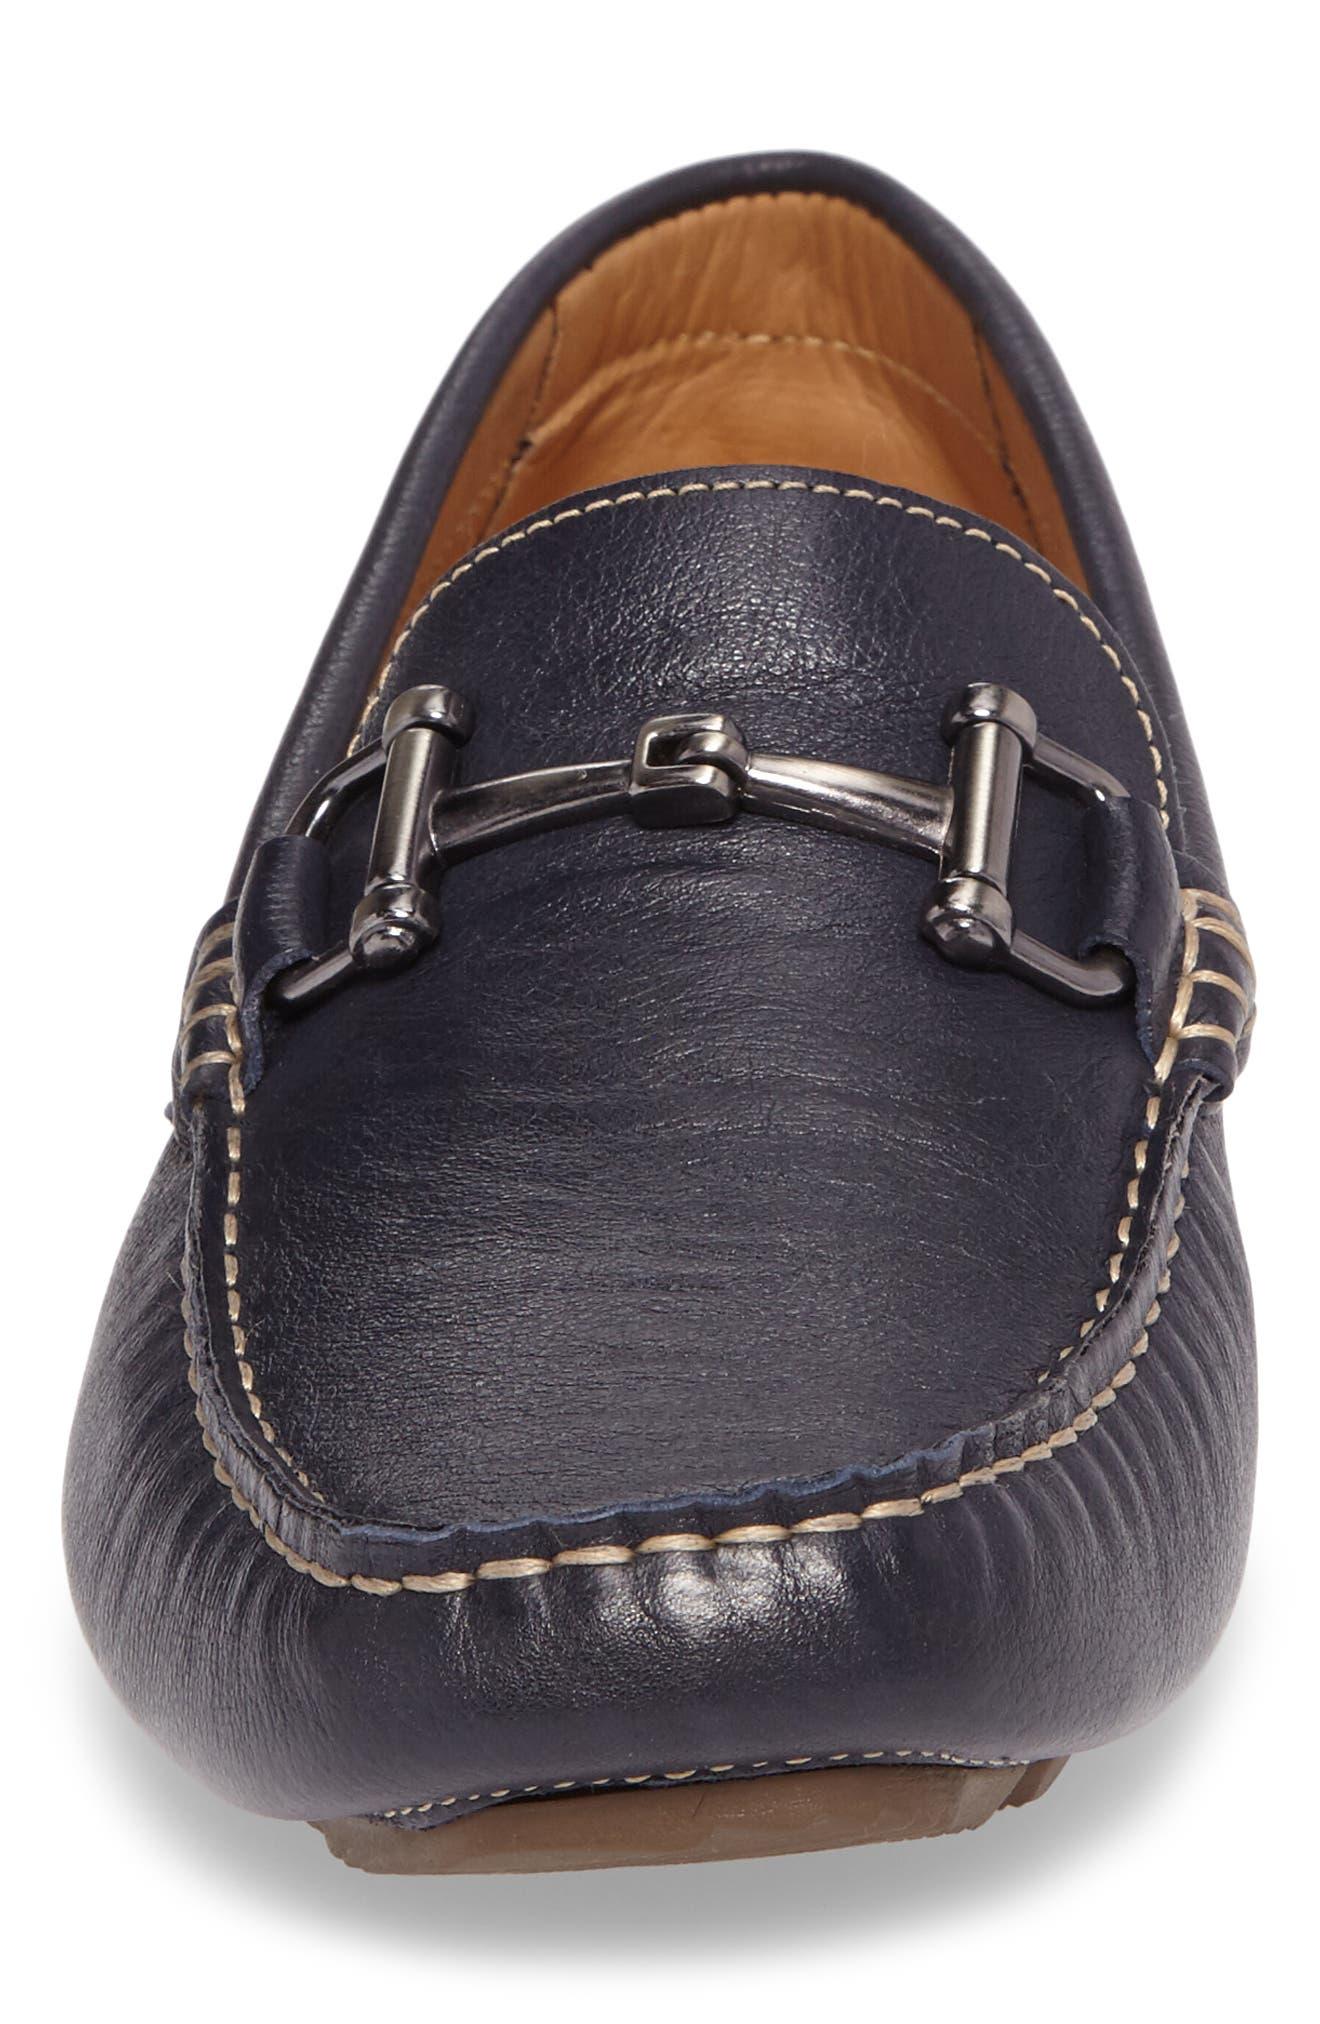 Topanga Driving Shoe,                             Alternate thumbnail 4, color,                             Navy Leather